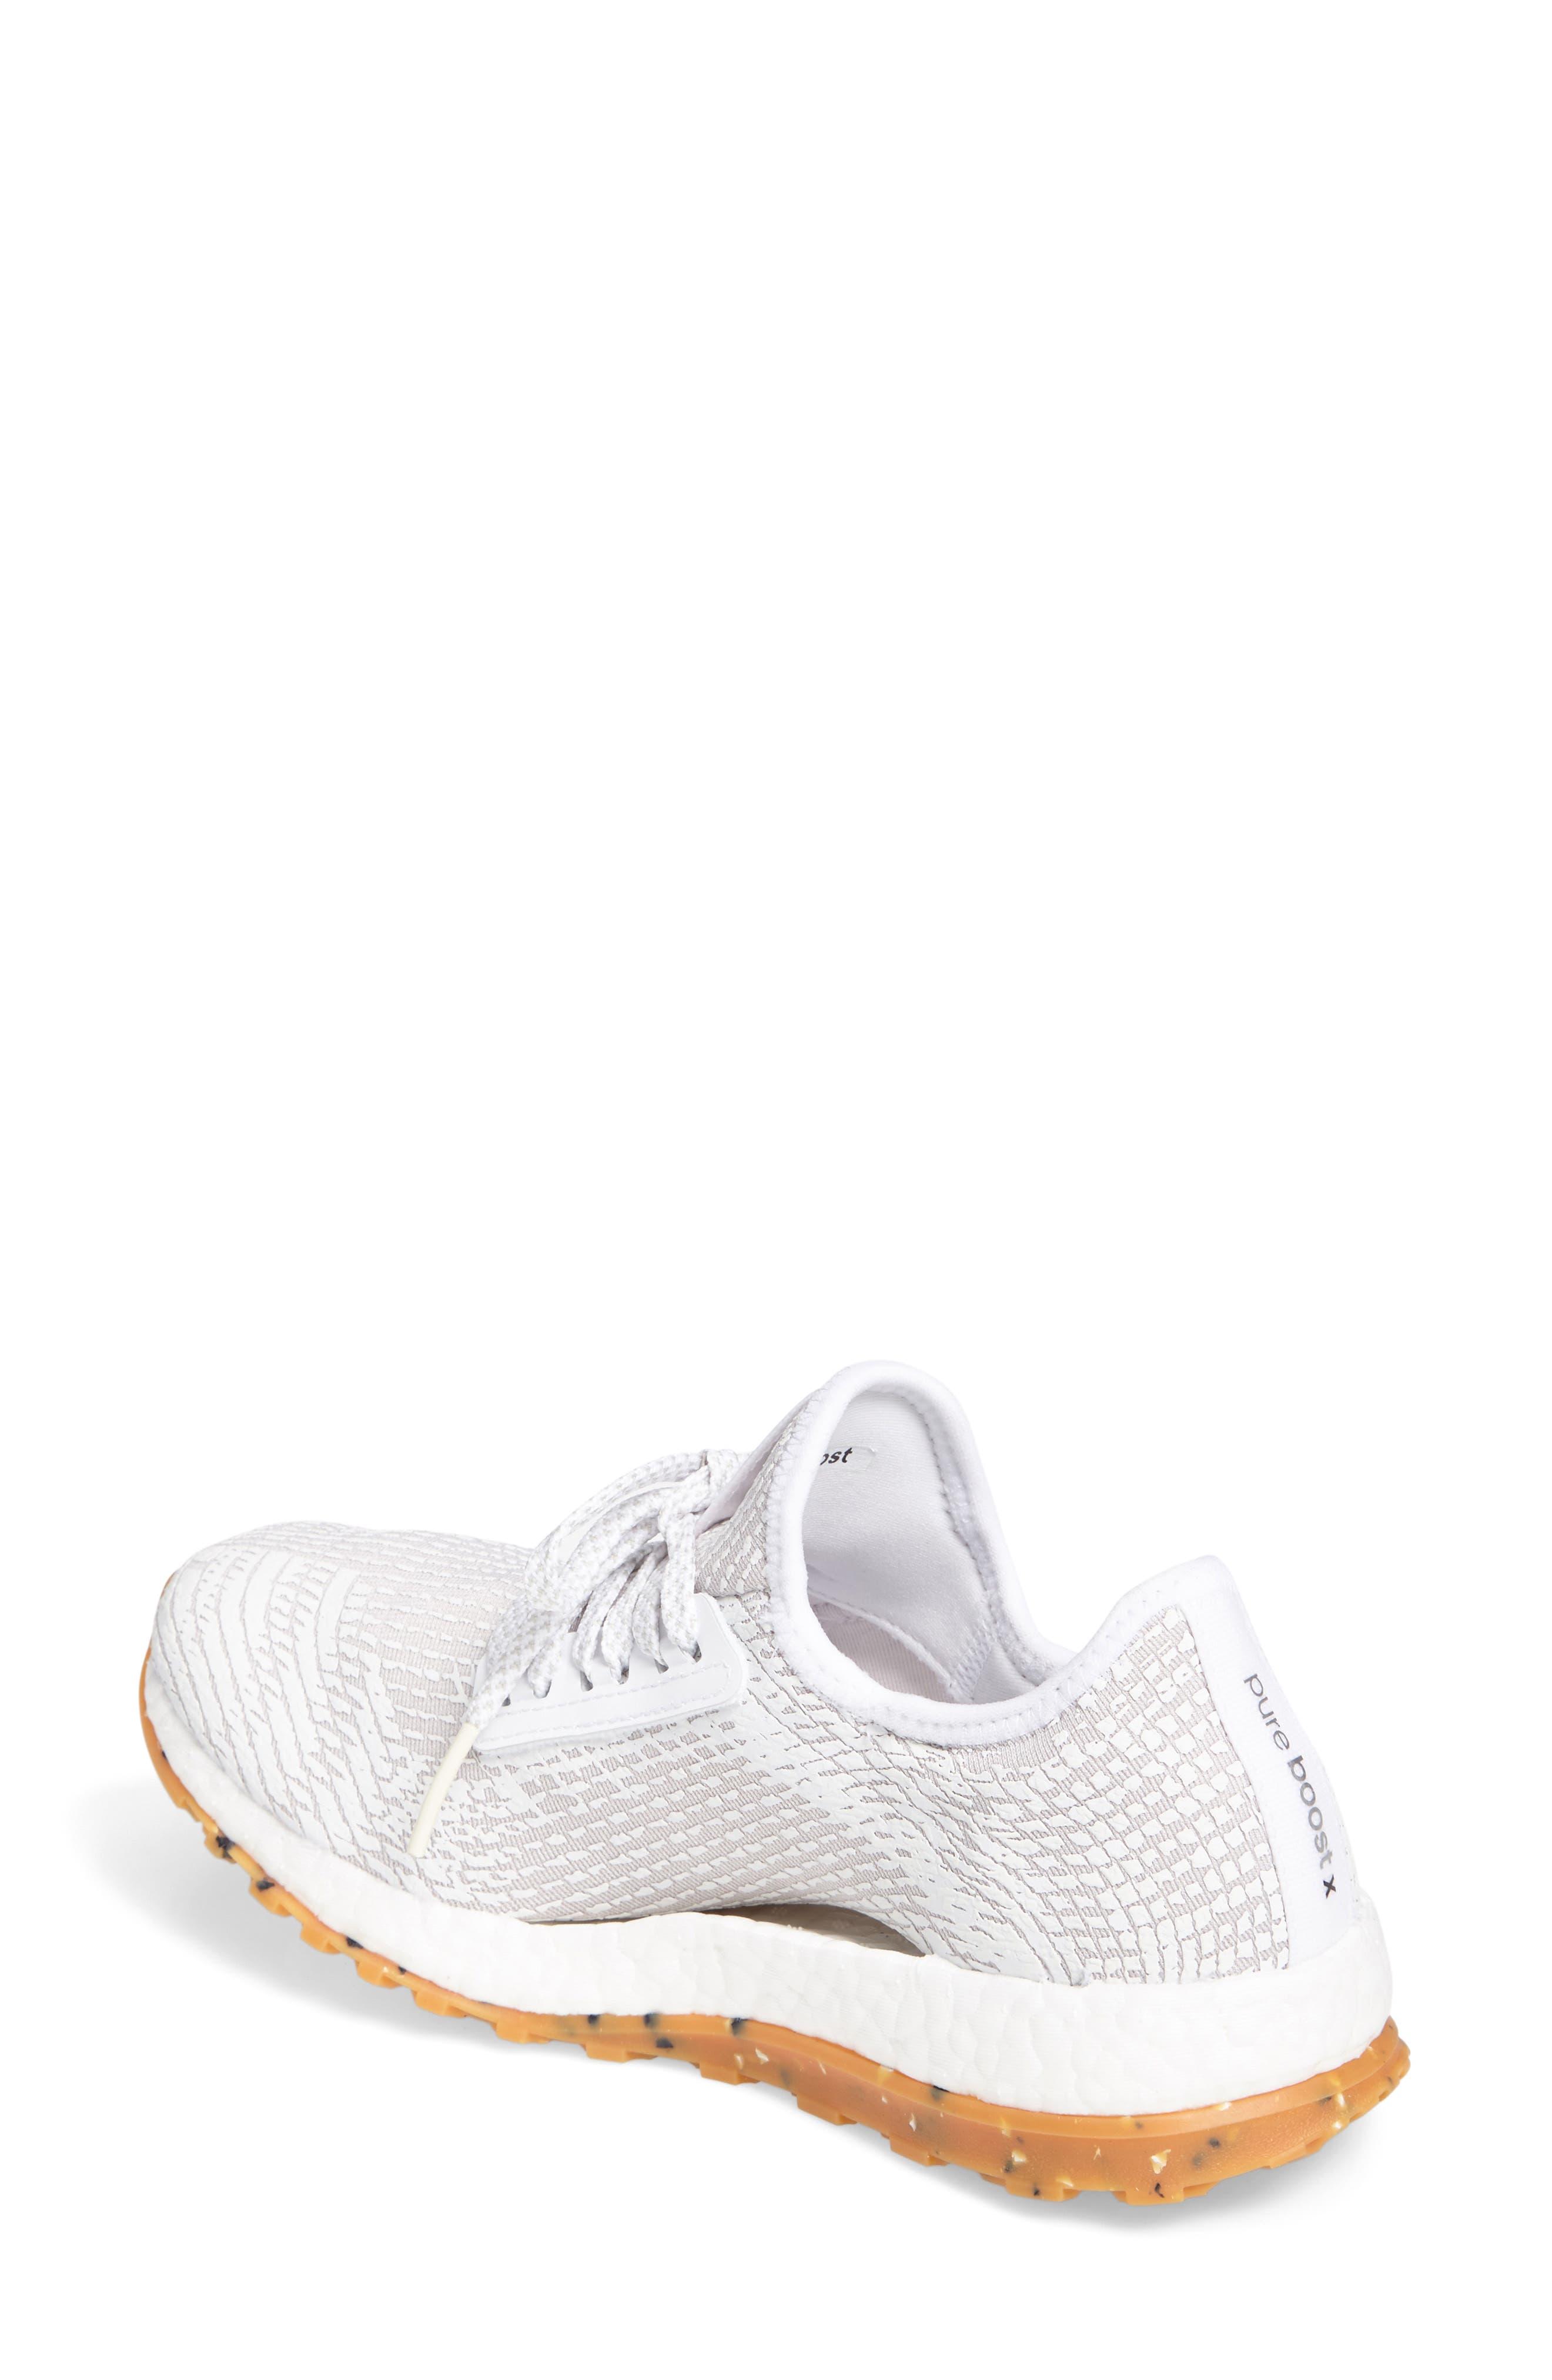 PureBoost X ATR Running Shoe,                             Alternate thumbnail 15, color,